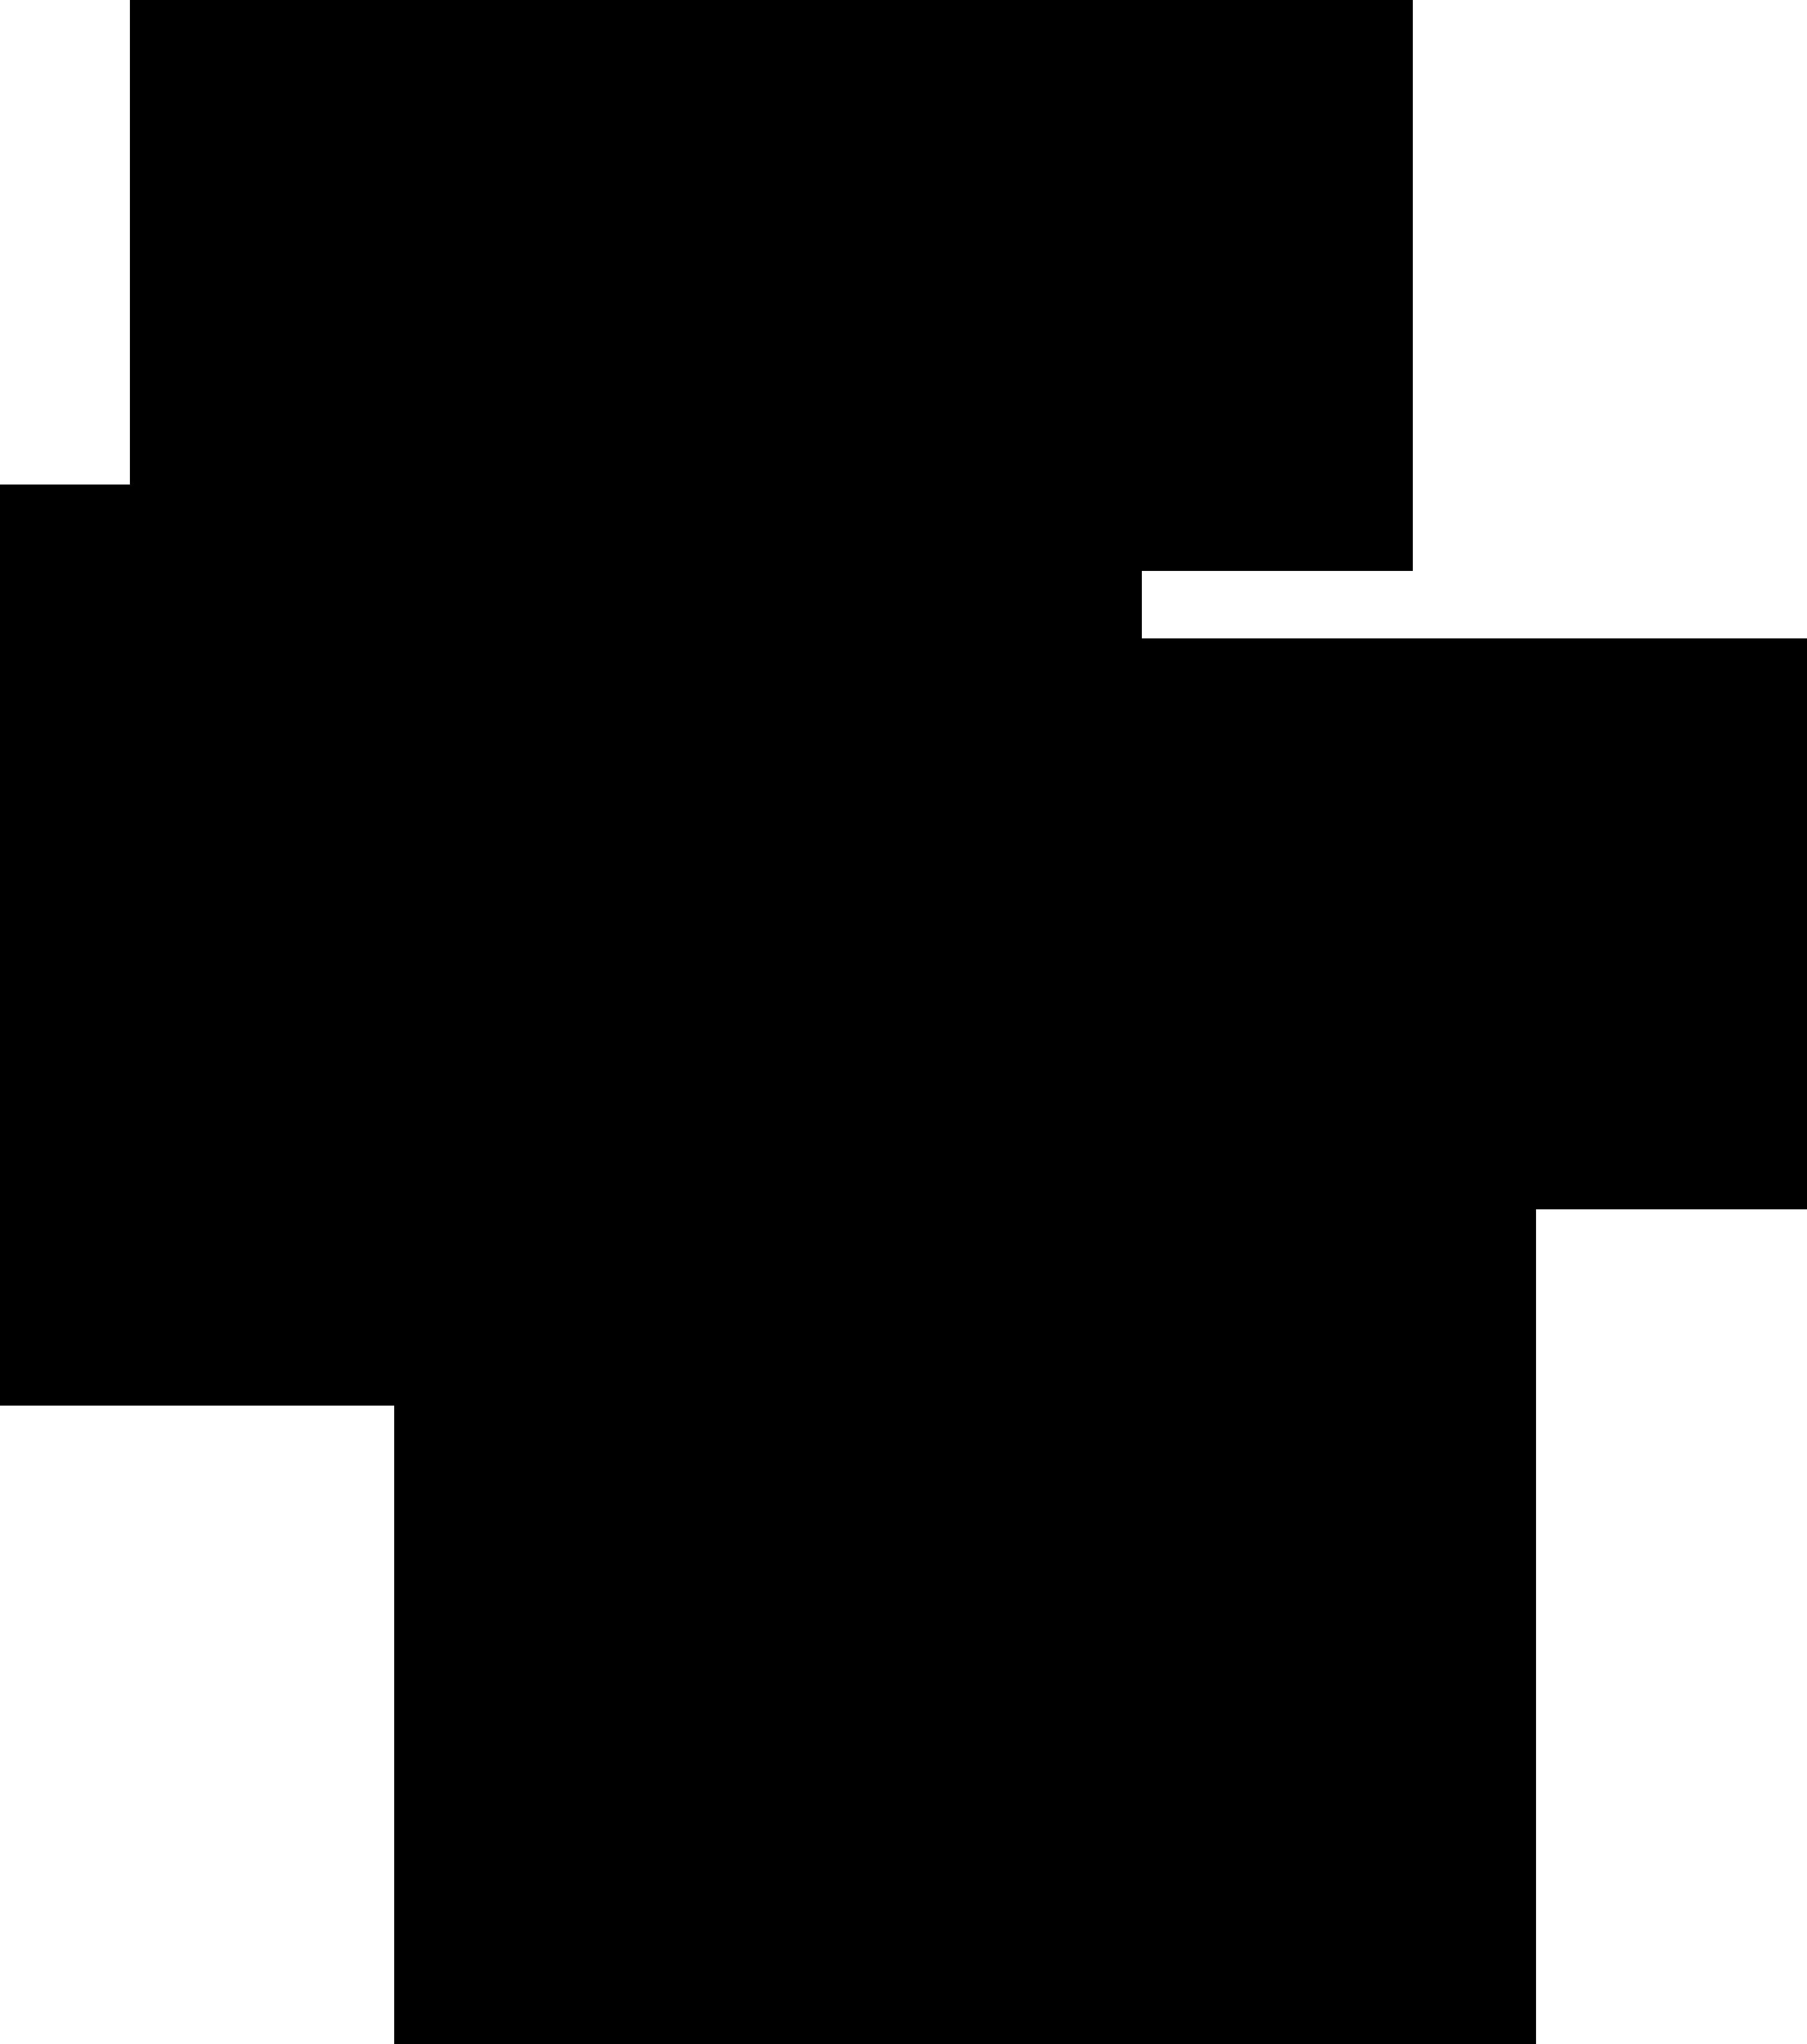 Nonbinary man symbol interlocked with a Mars symbol.